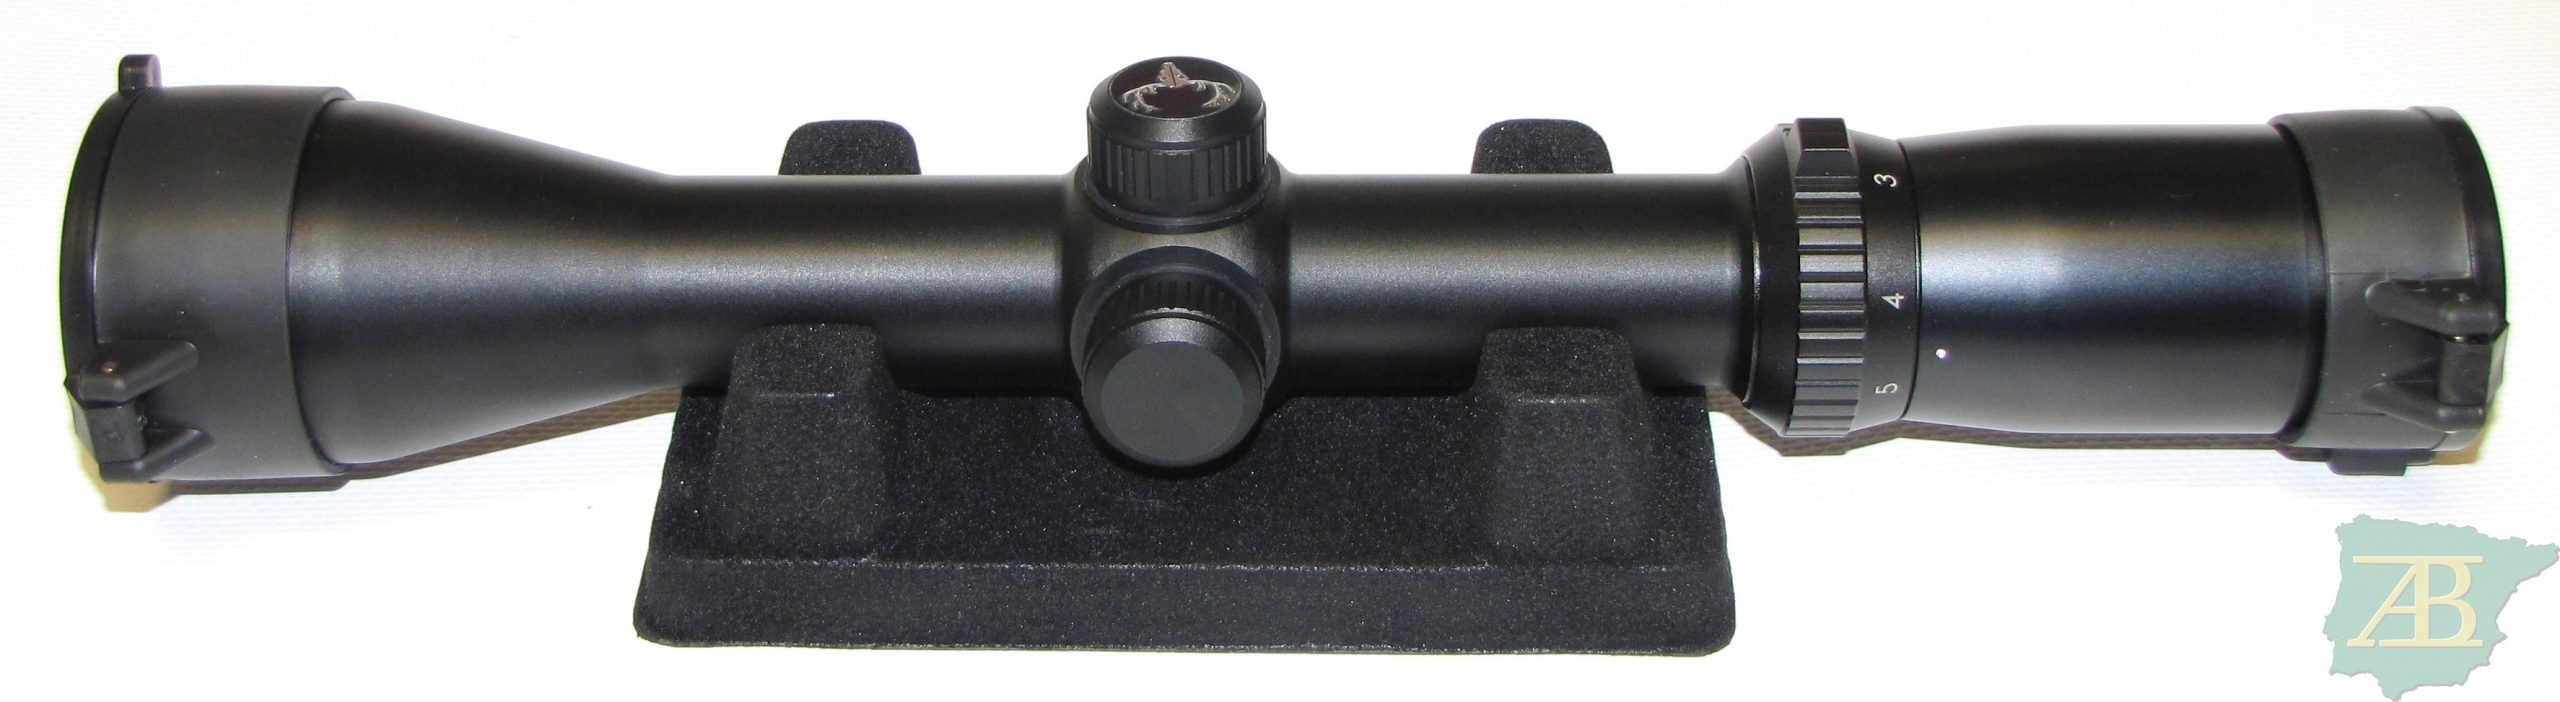 VISOR BUSHNELL TROPHY XLT 1.5-6×44